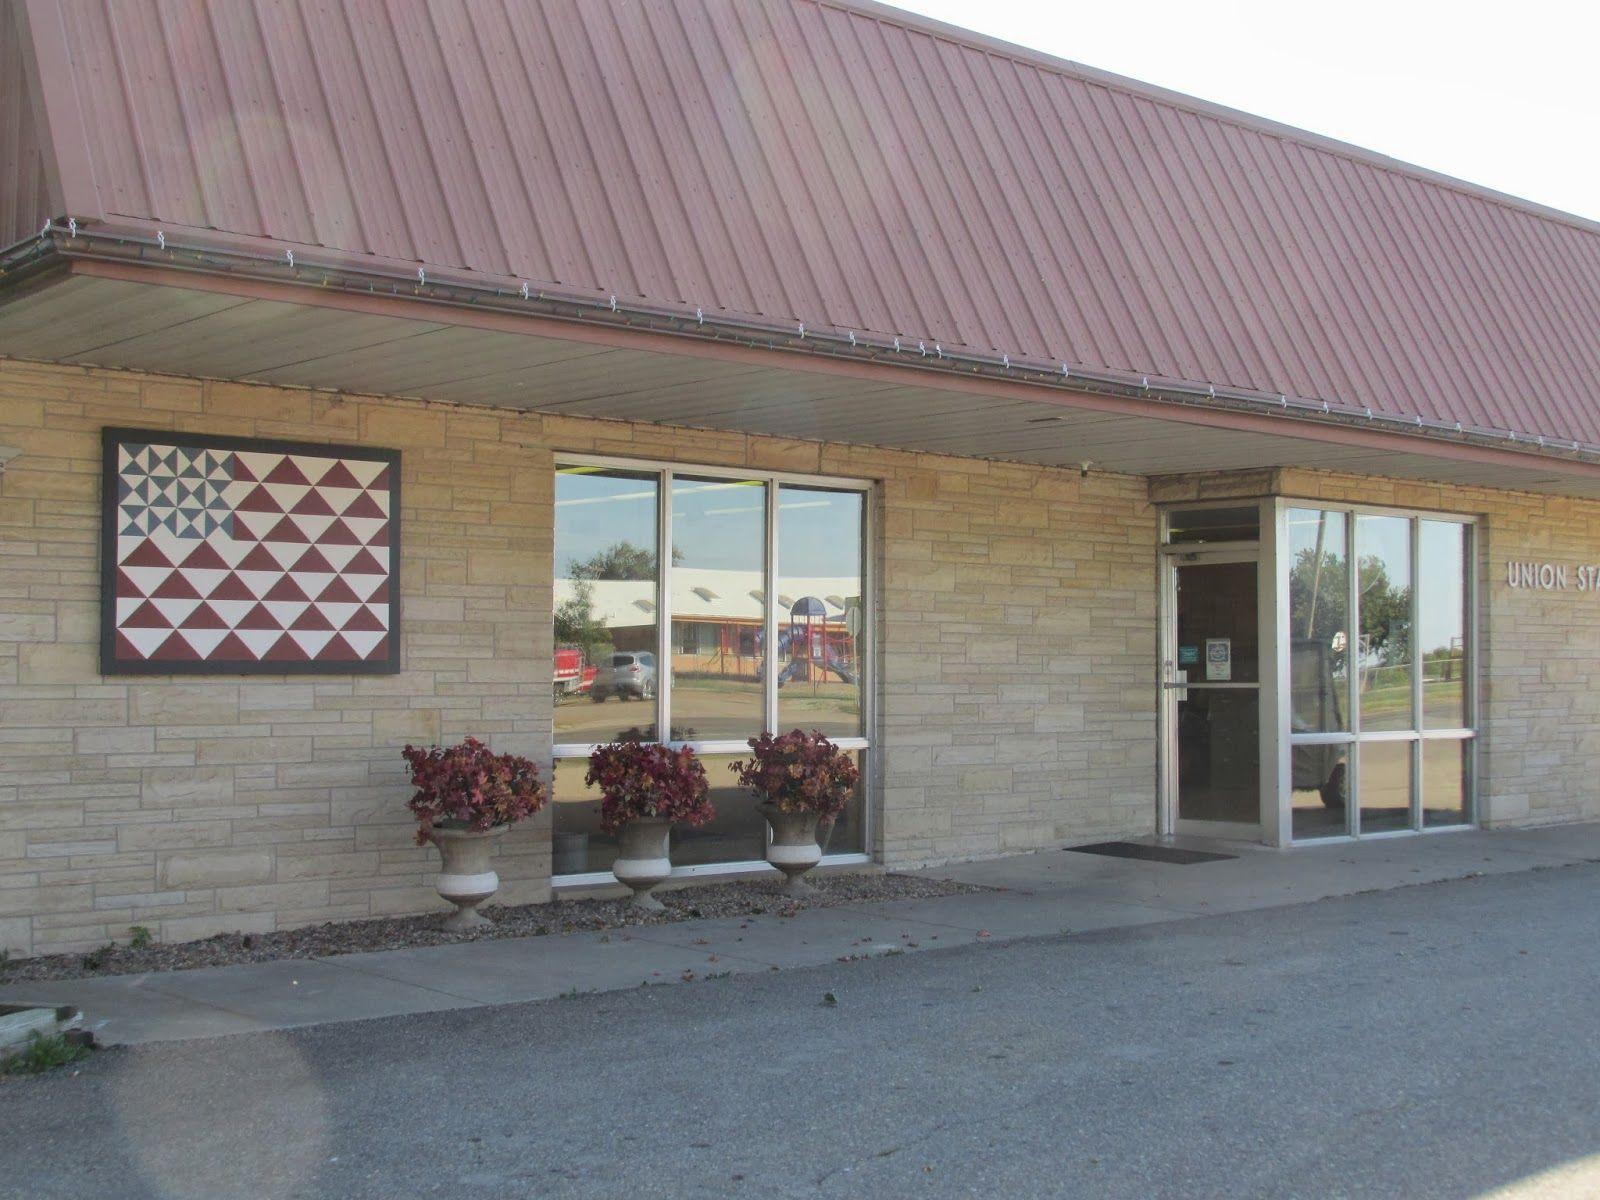 Kansas pottawatomie county fostoria - Kansas Flint Hills Quilt Trail Pottawatomie County Community Union State Bank 204 E Hwy 16 Olsburg Ks 66520 Pinterest Quilt Us States And Ps